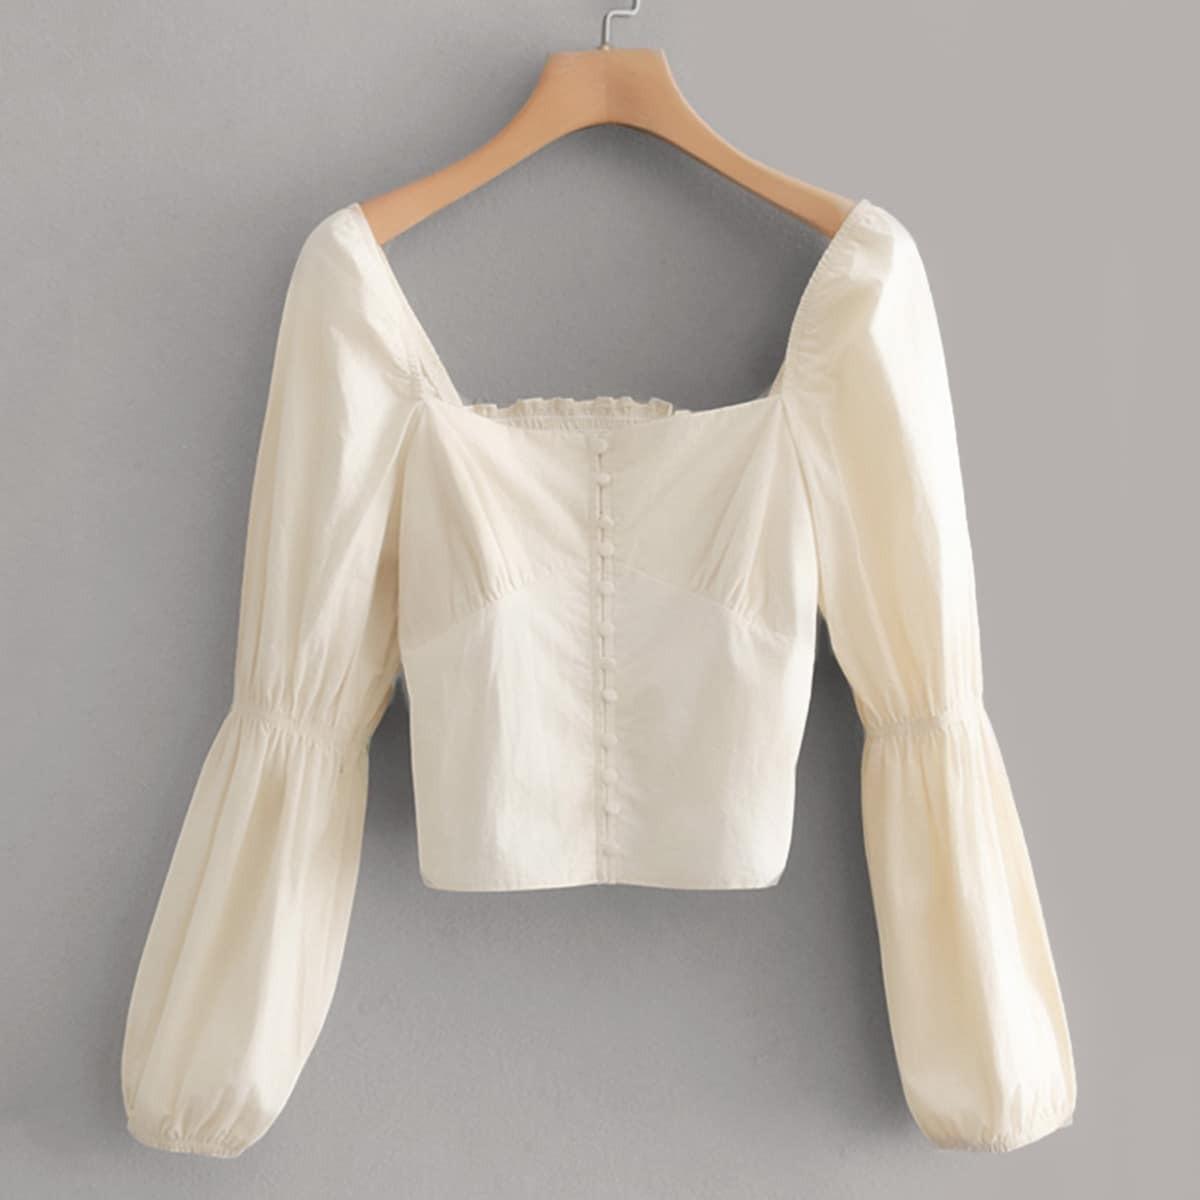 Нарядная Белая Блуза С Глубоким Вырезом И Гофрированным Рукавом SheIn swblouse02190321001